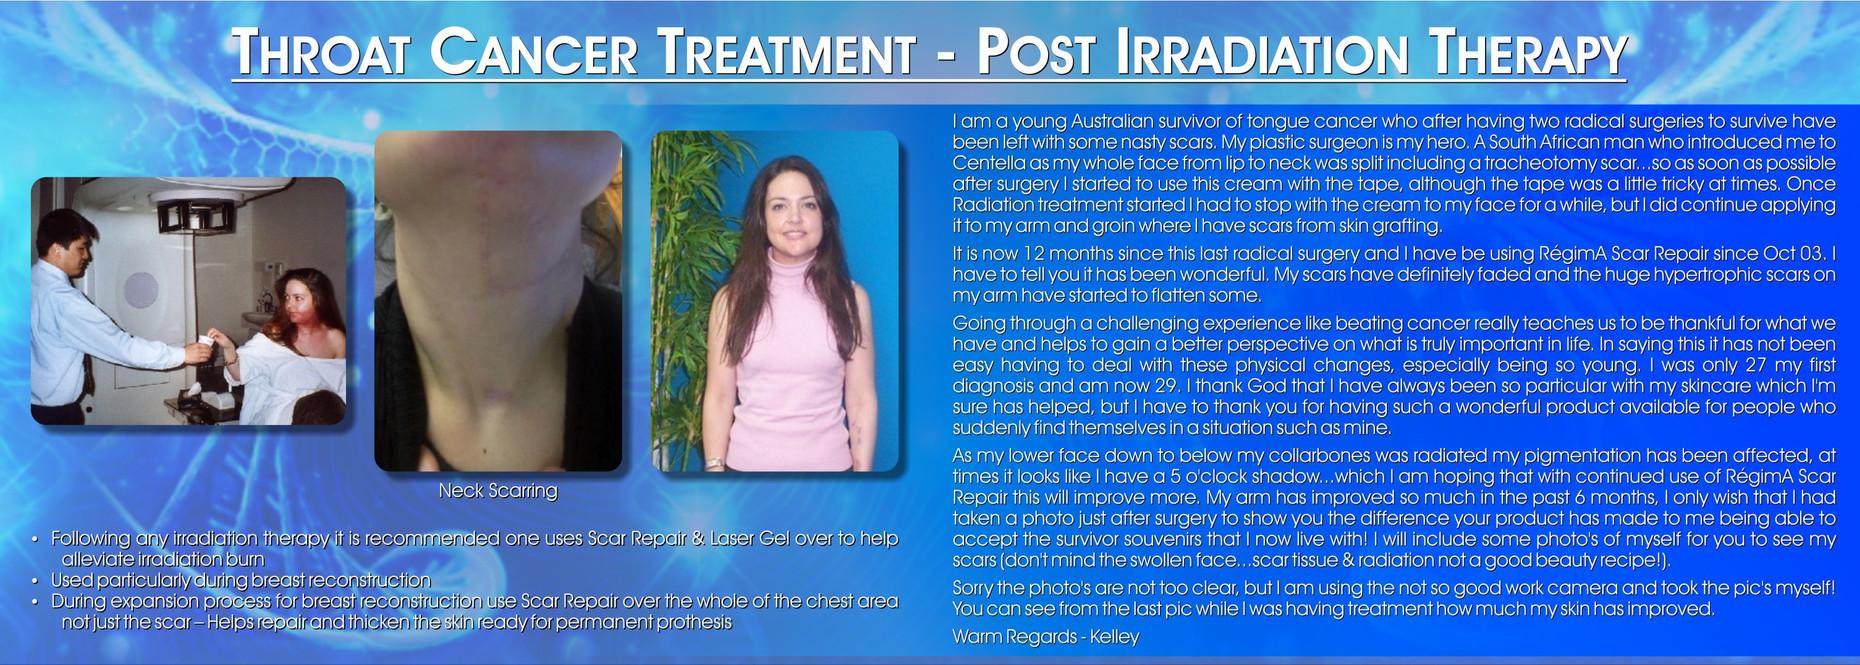 Throat Cancer Treatment